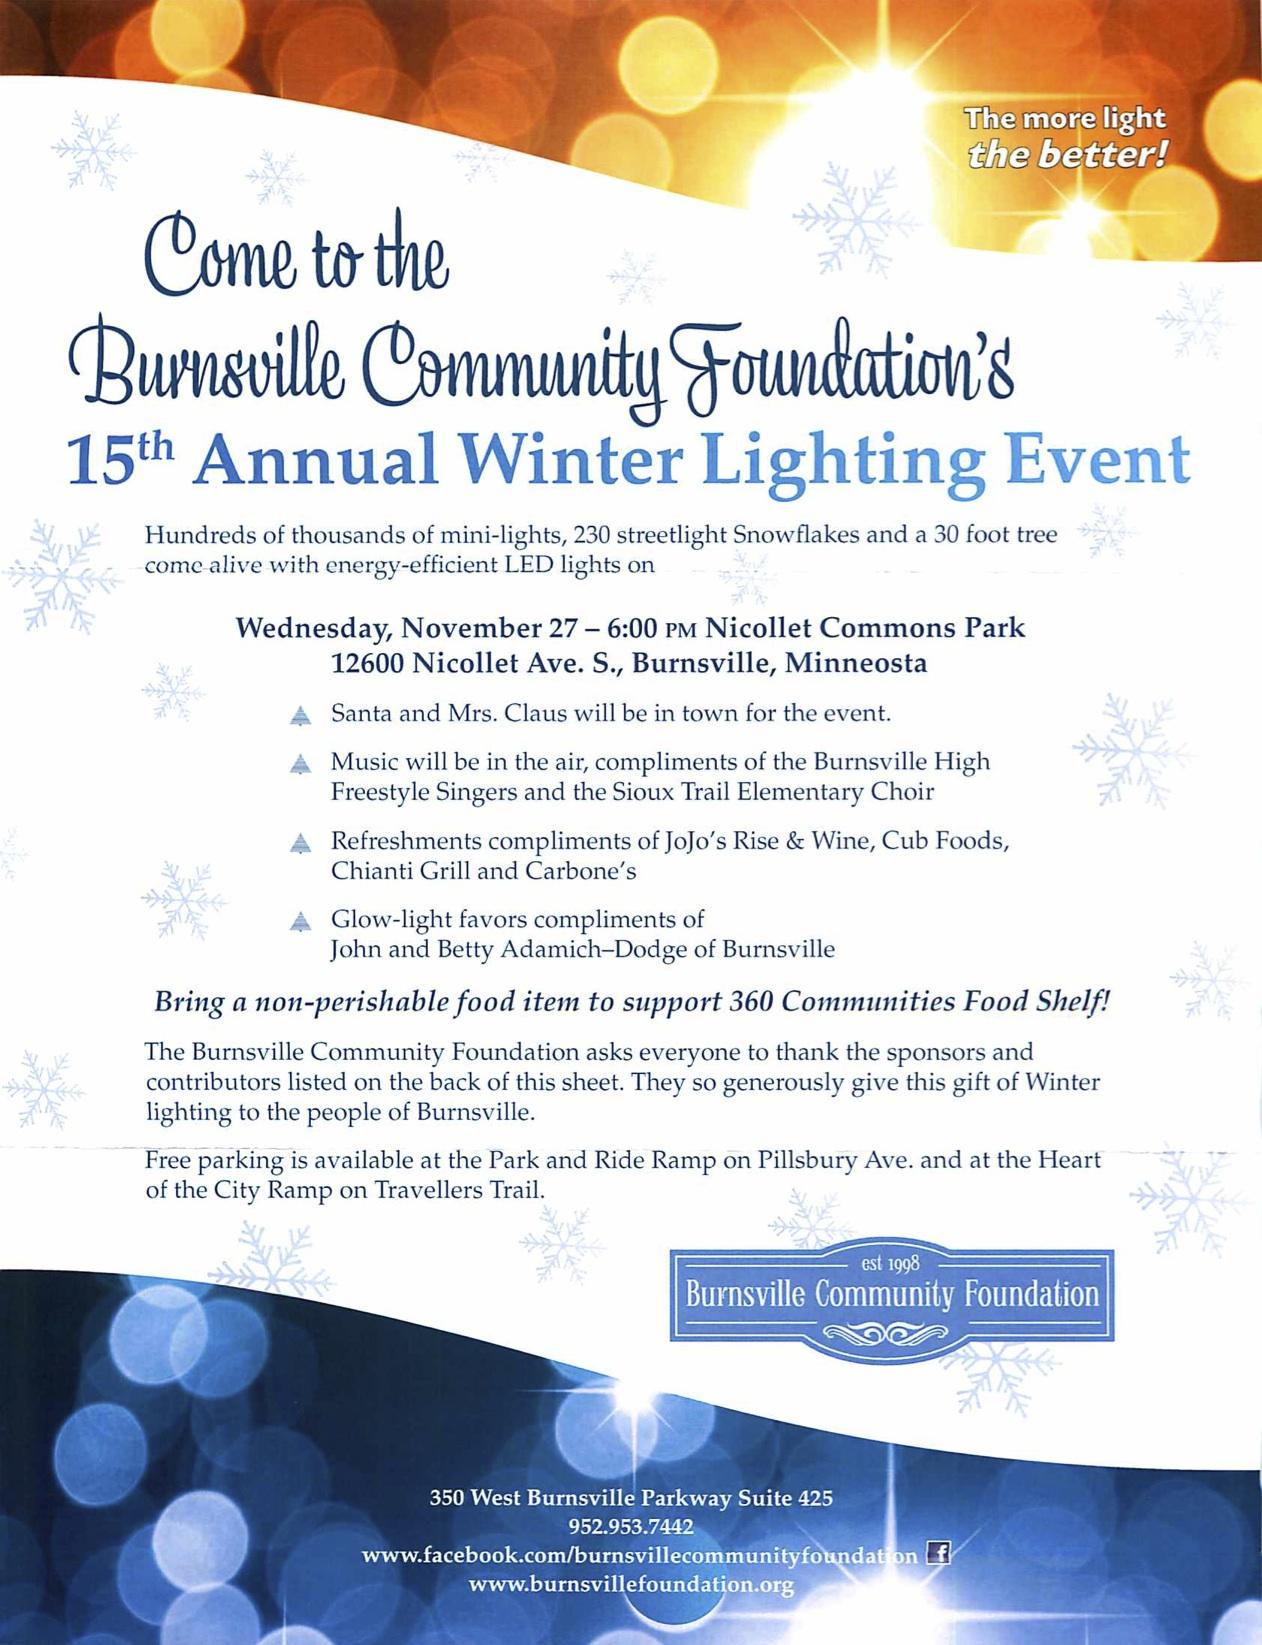 2013 Burnsville Minnesota Winter Lighting Event